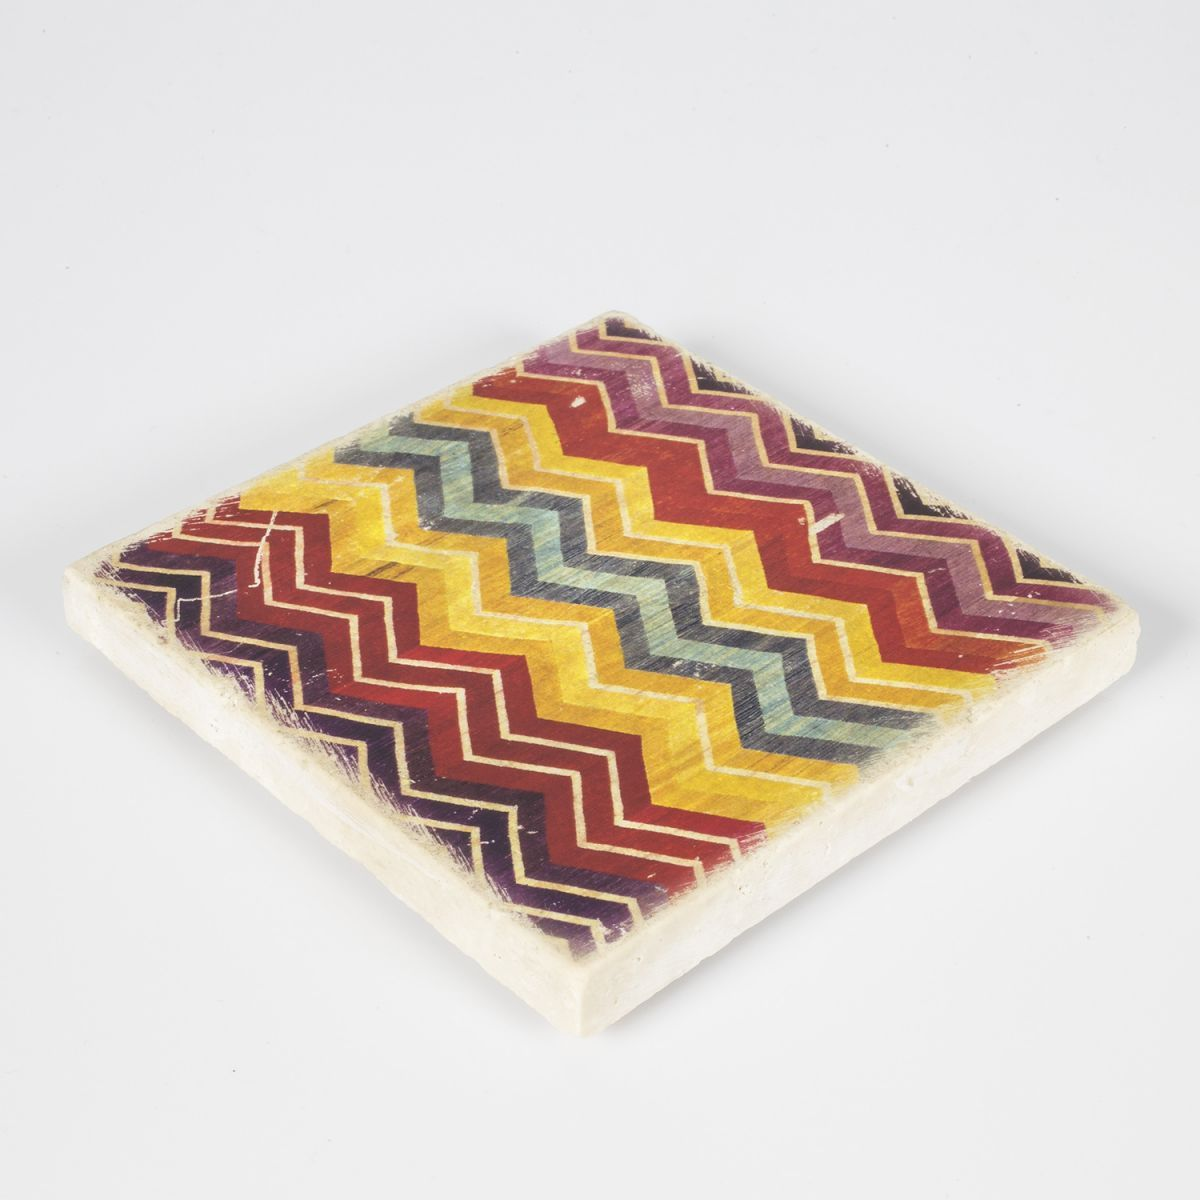 Coaster Travertine D14 - (10x10)